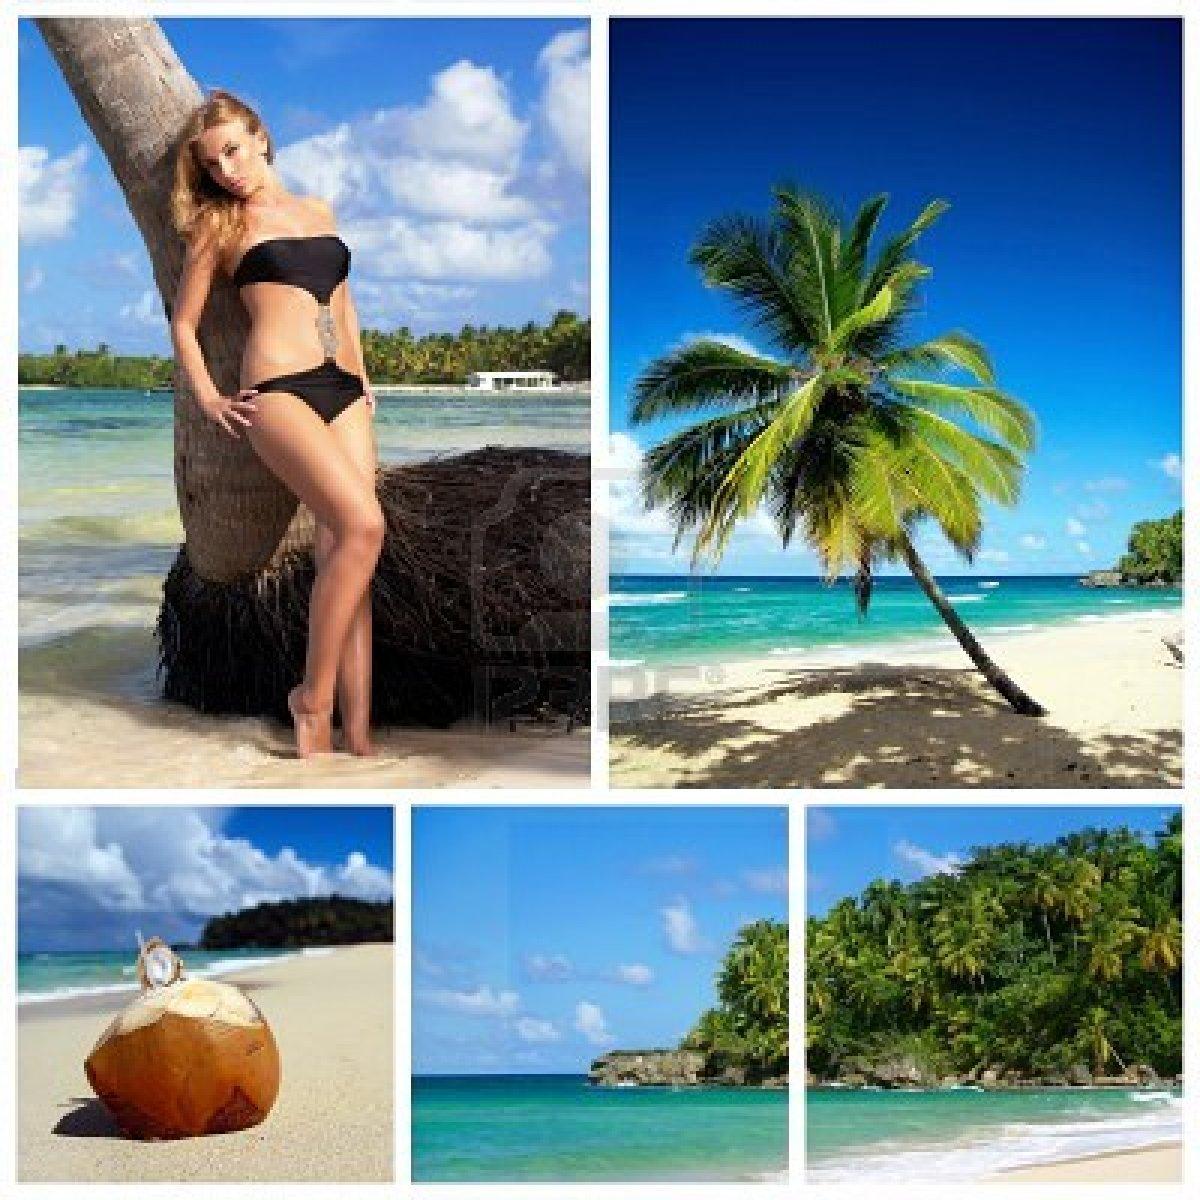 http://3.bp.blogspot.com/-BaABrsg7wUk/Tt4sxHcYzOI/AAAAAAAACxw/fXSMJUS5kCs/s1600/R%25C3%25A9publique+Dominicaine+plage+5+images.jpg